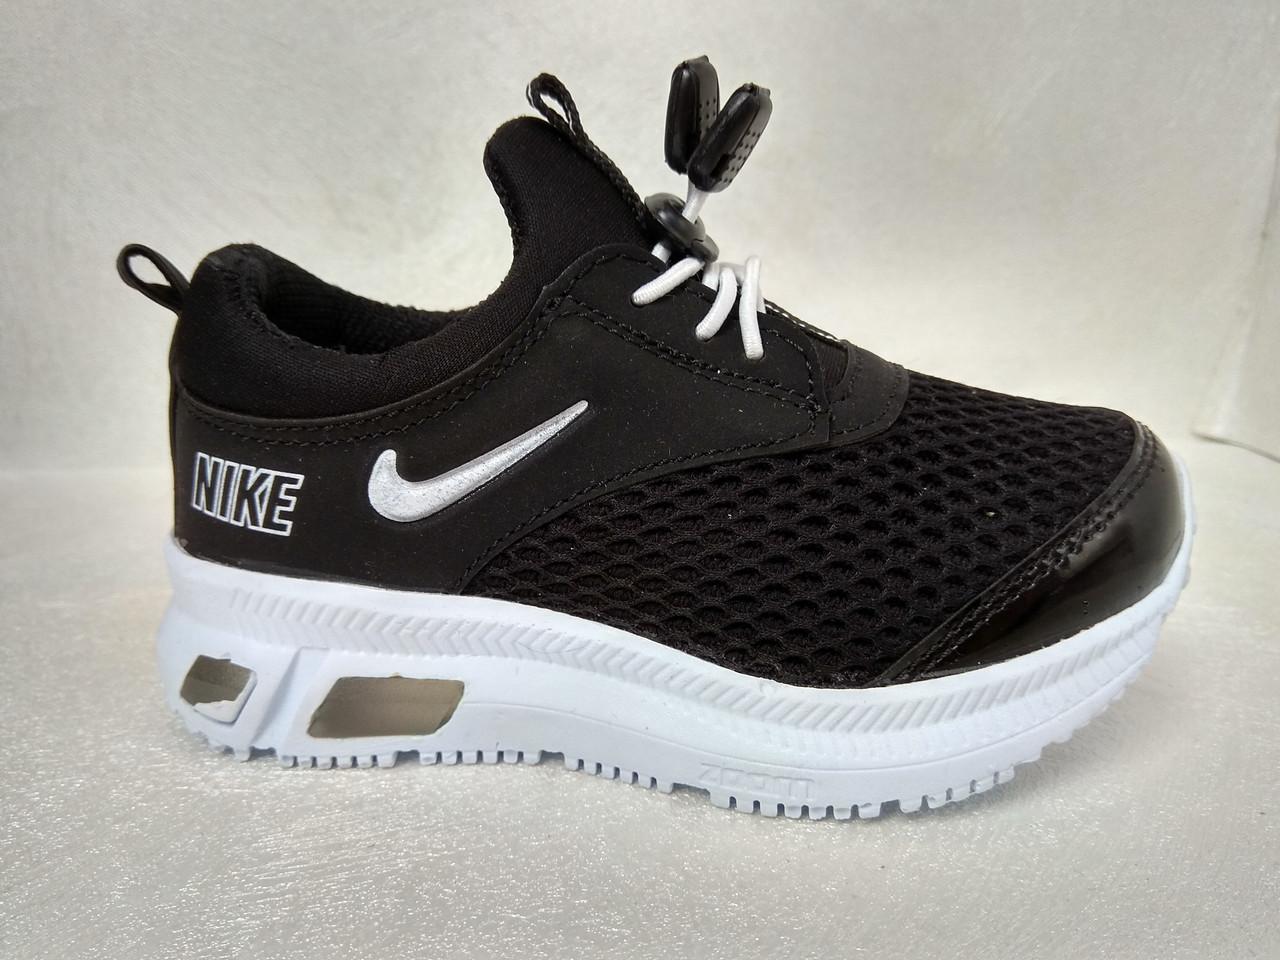 1fbac6fd9 Детские кроссовки Nike оптом 3019 black (р.26-30) Турция реплика ...